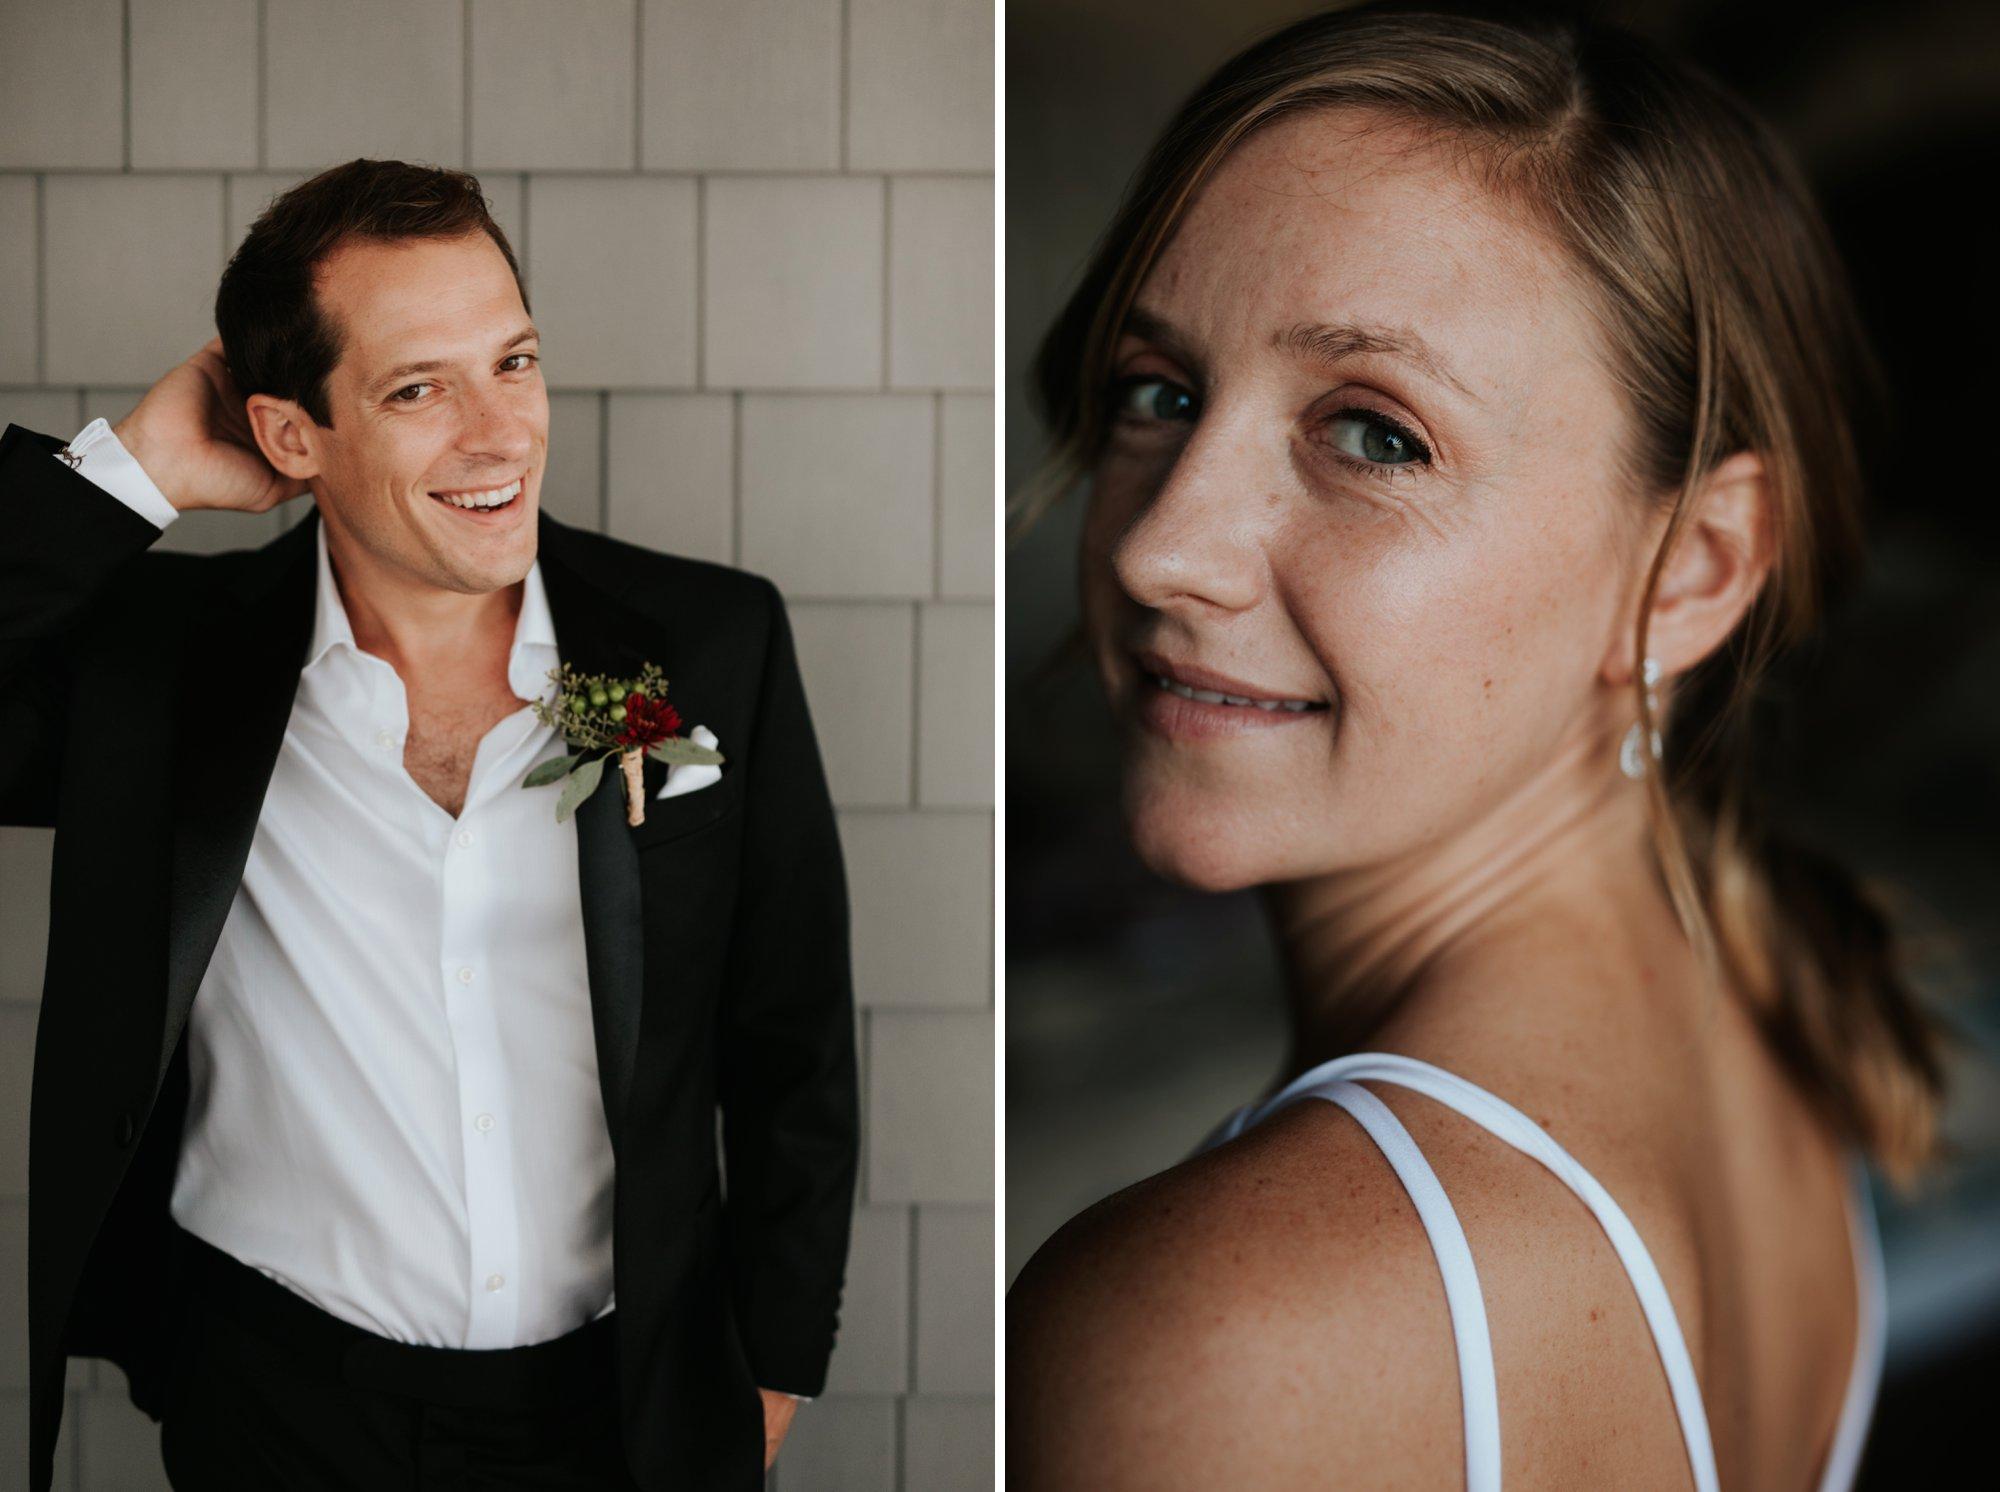 Low key backyard beach wedding in Sandbridge, VA individual portraits